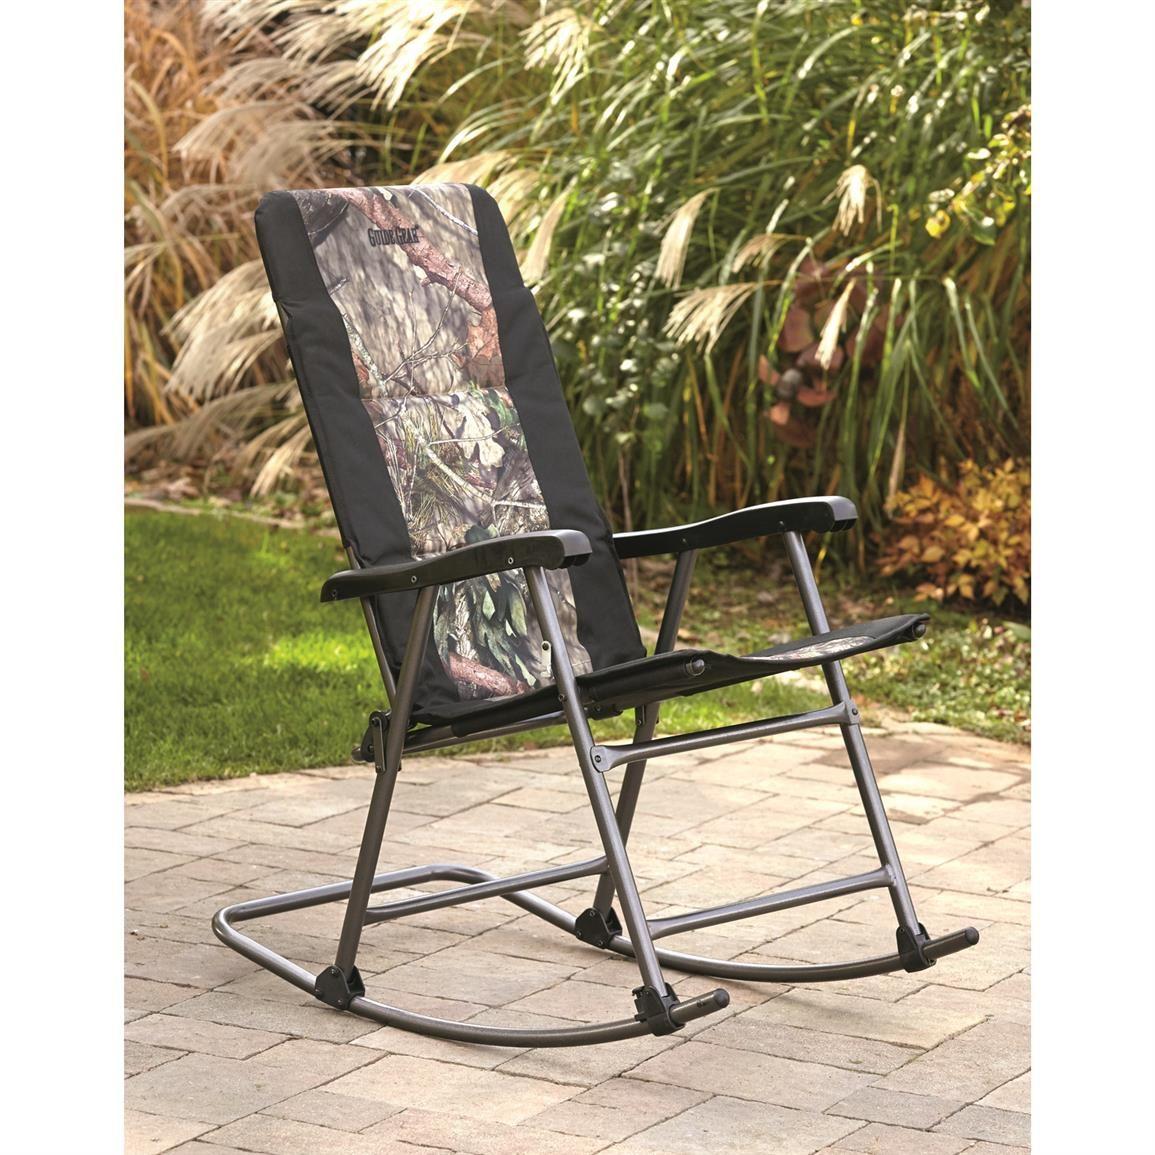 Guide Gear Oversized Camping Mossy Oak Camo Rocking Chair